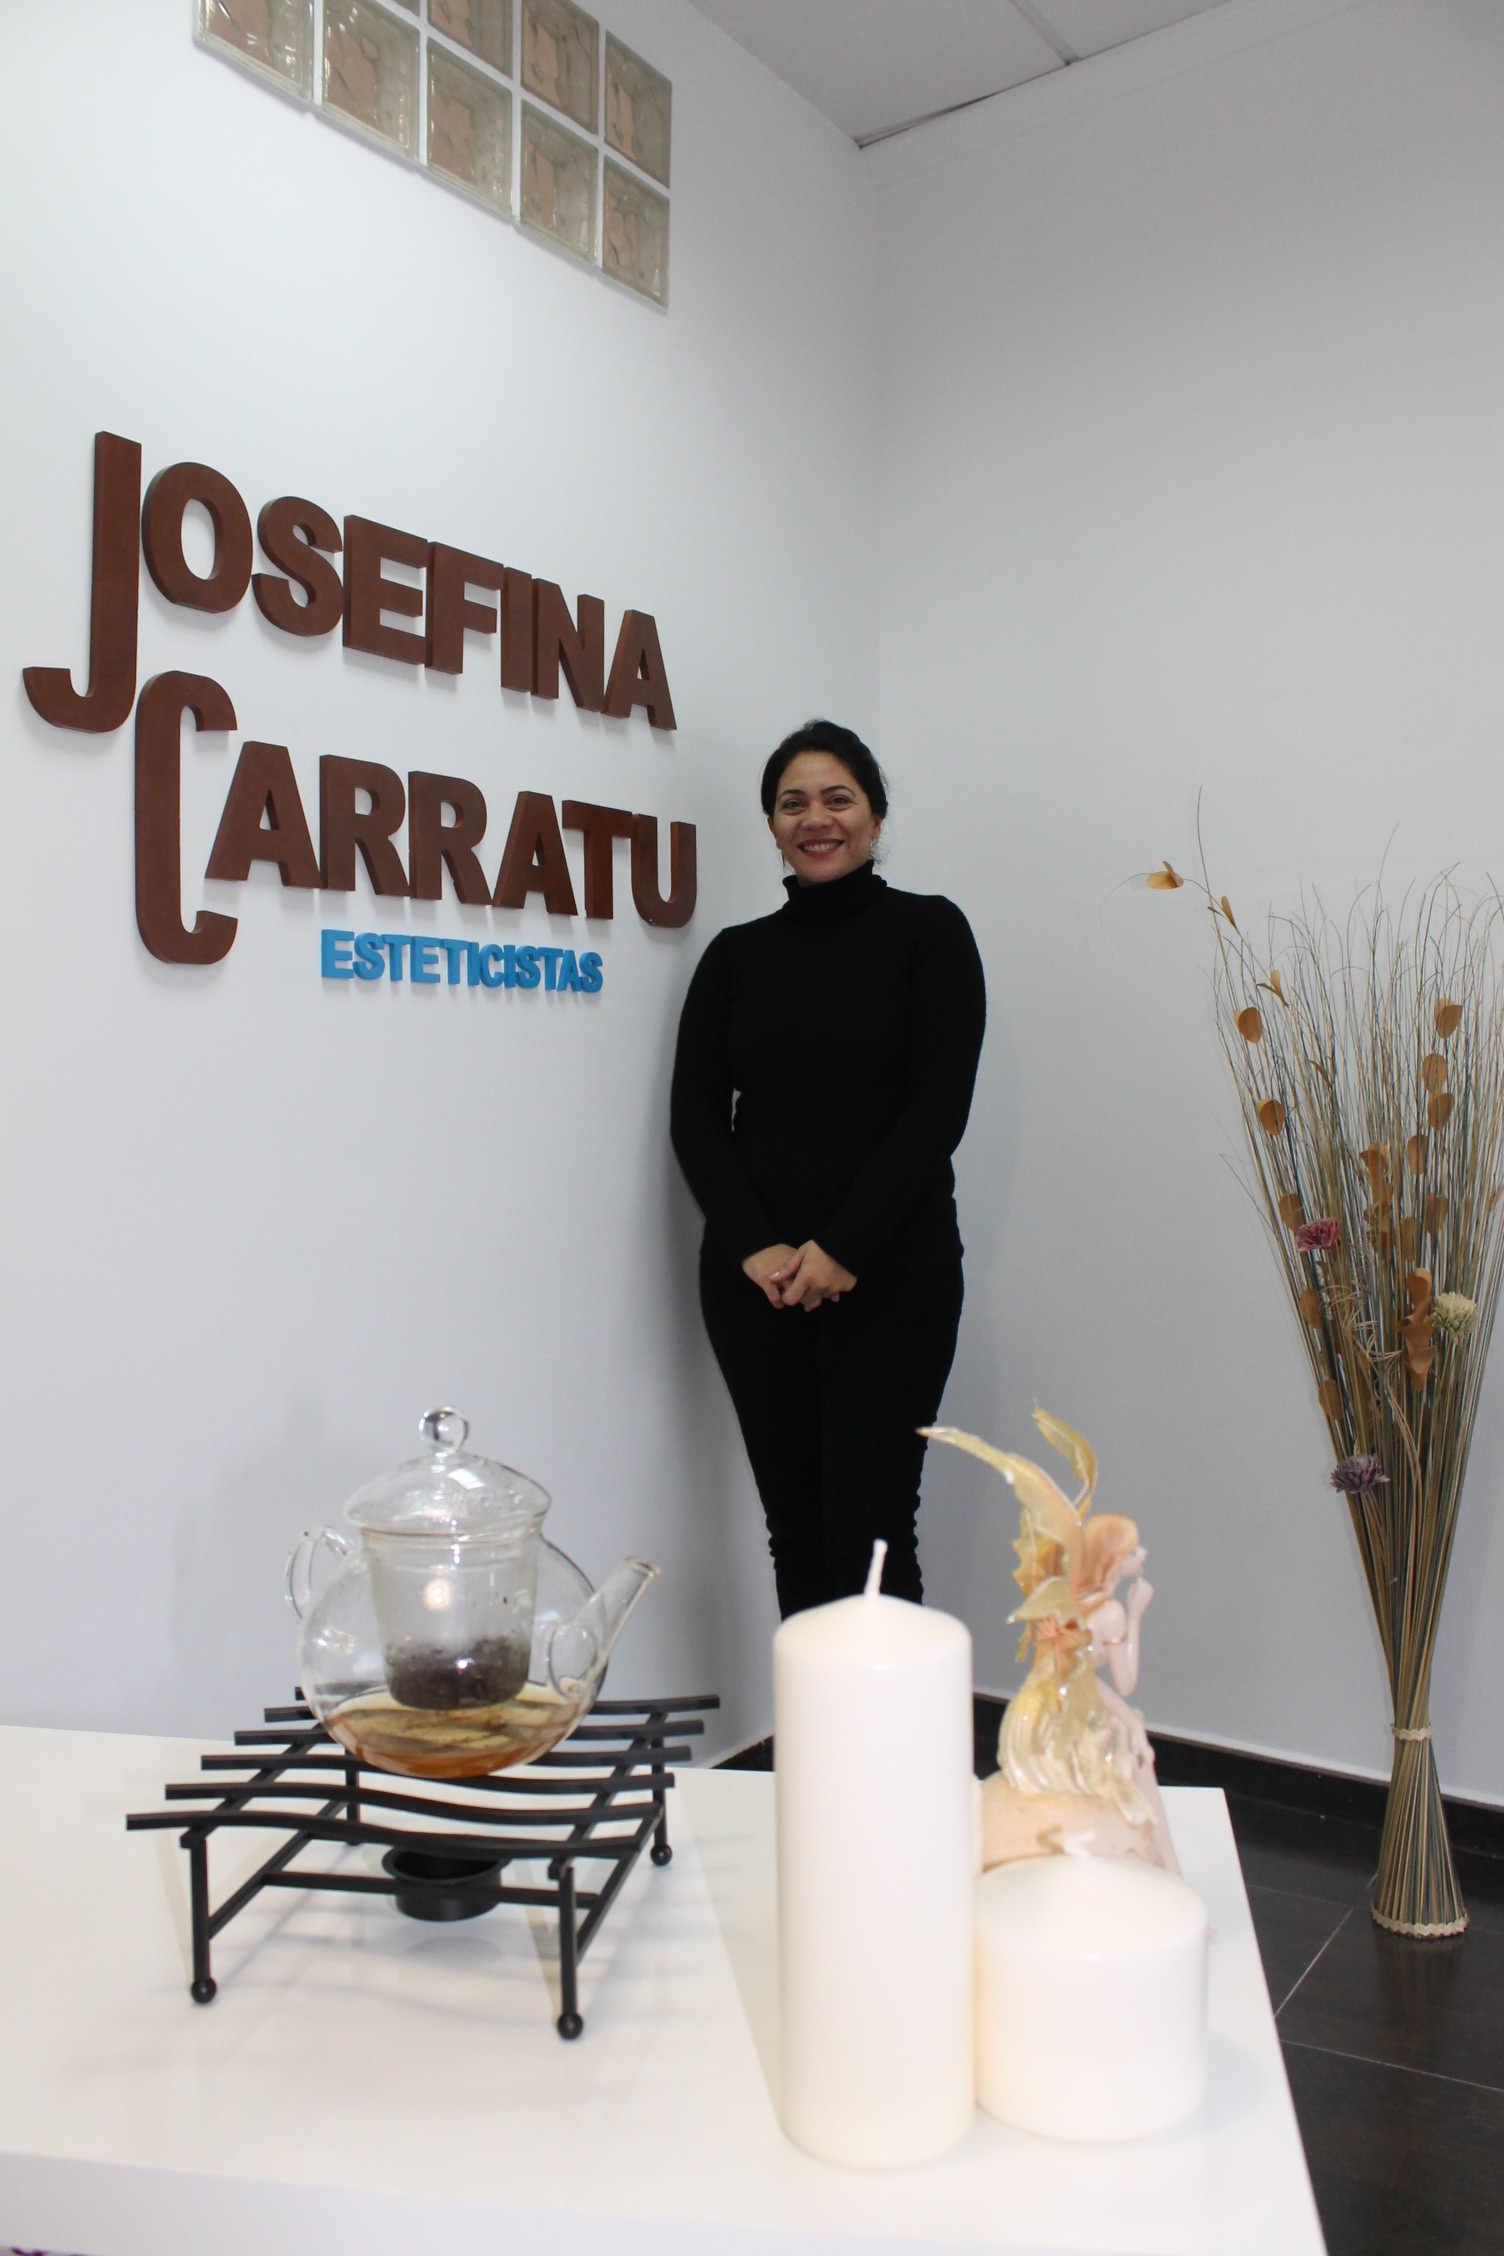 Josefina Carratu